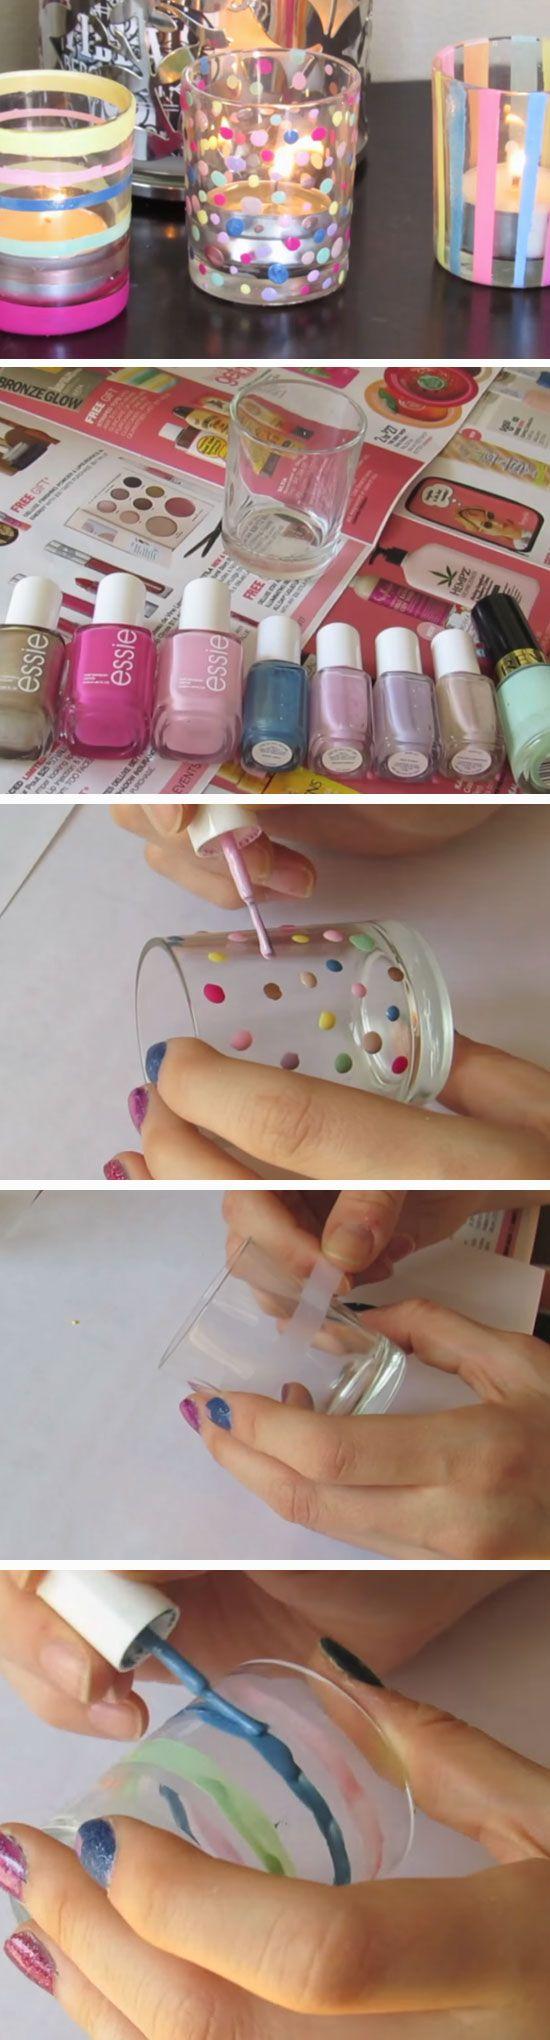 Pastel Votives   DIY Easter Party Favor Ideas for Teens   Handmade Spring Gift Ideas for Kids